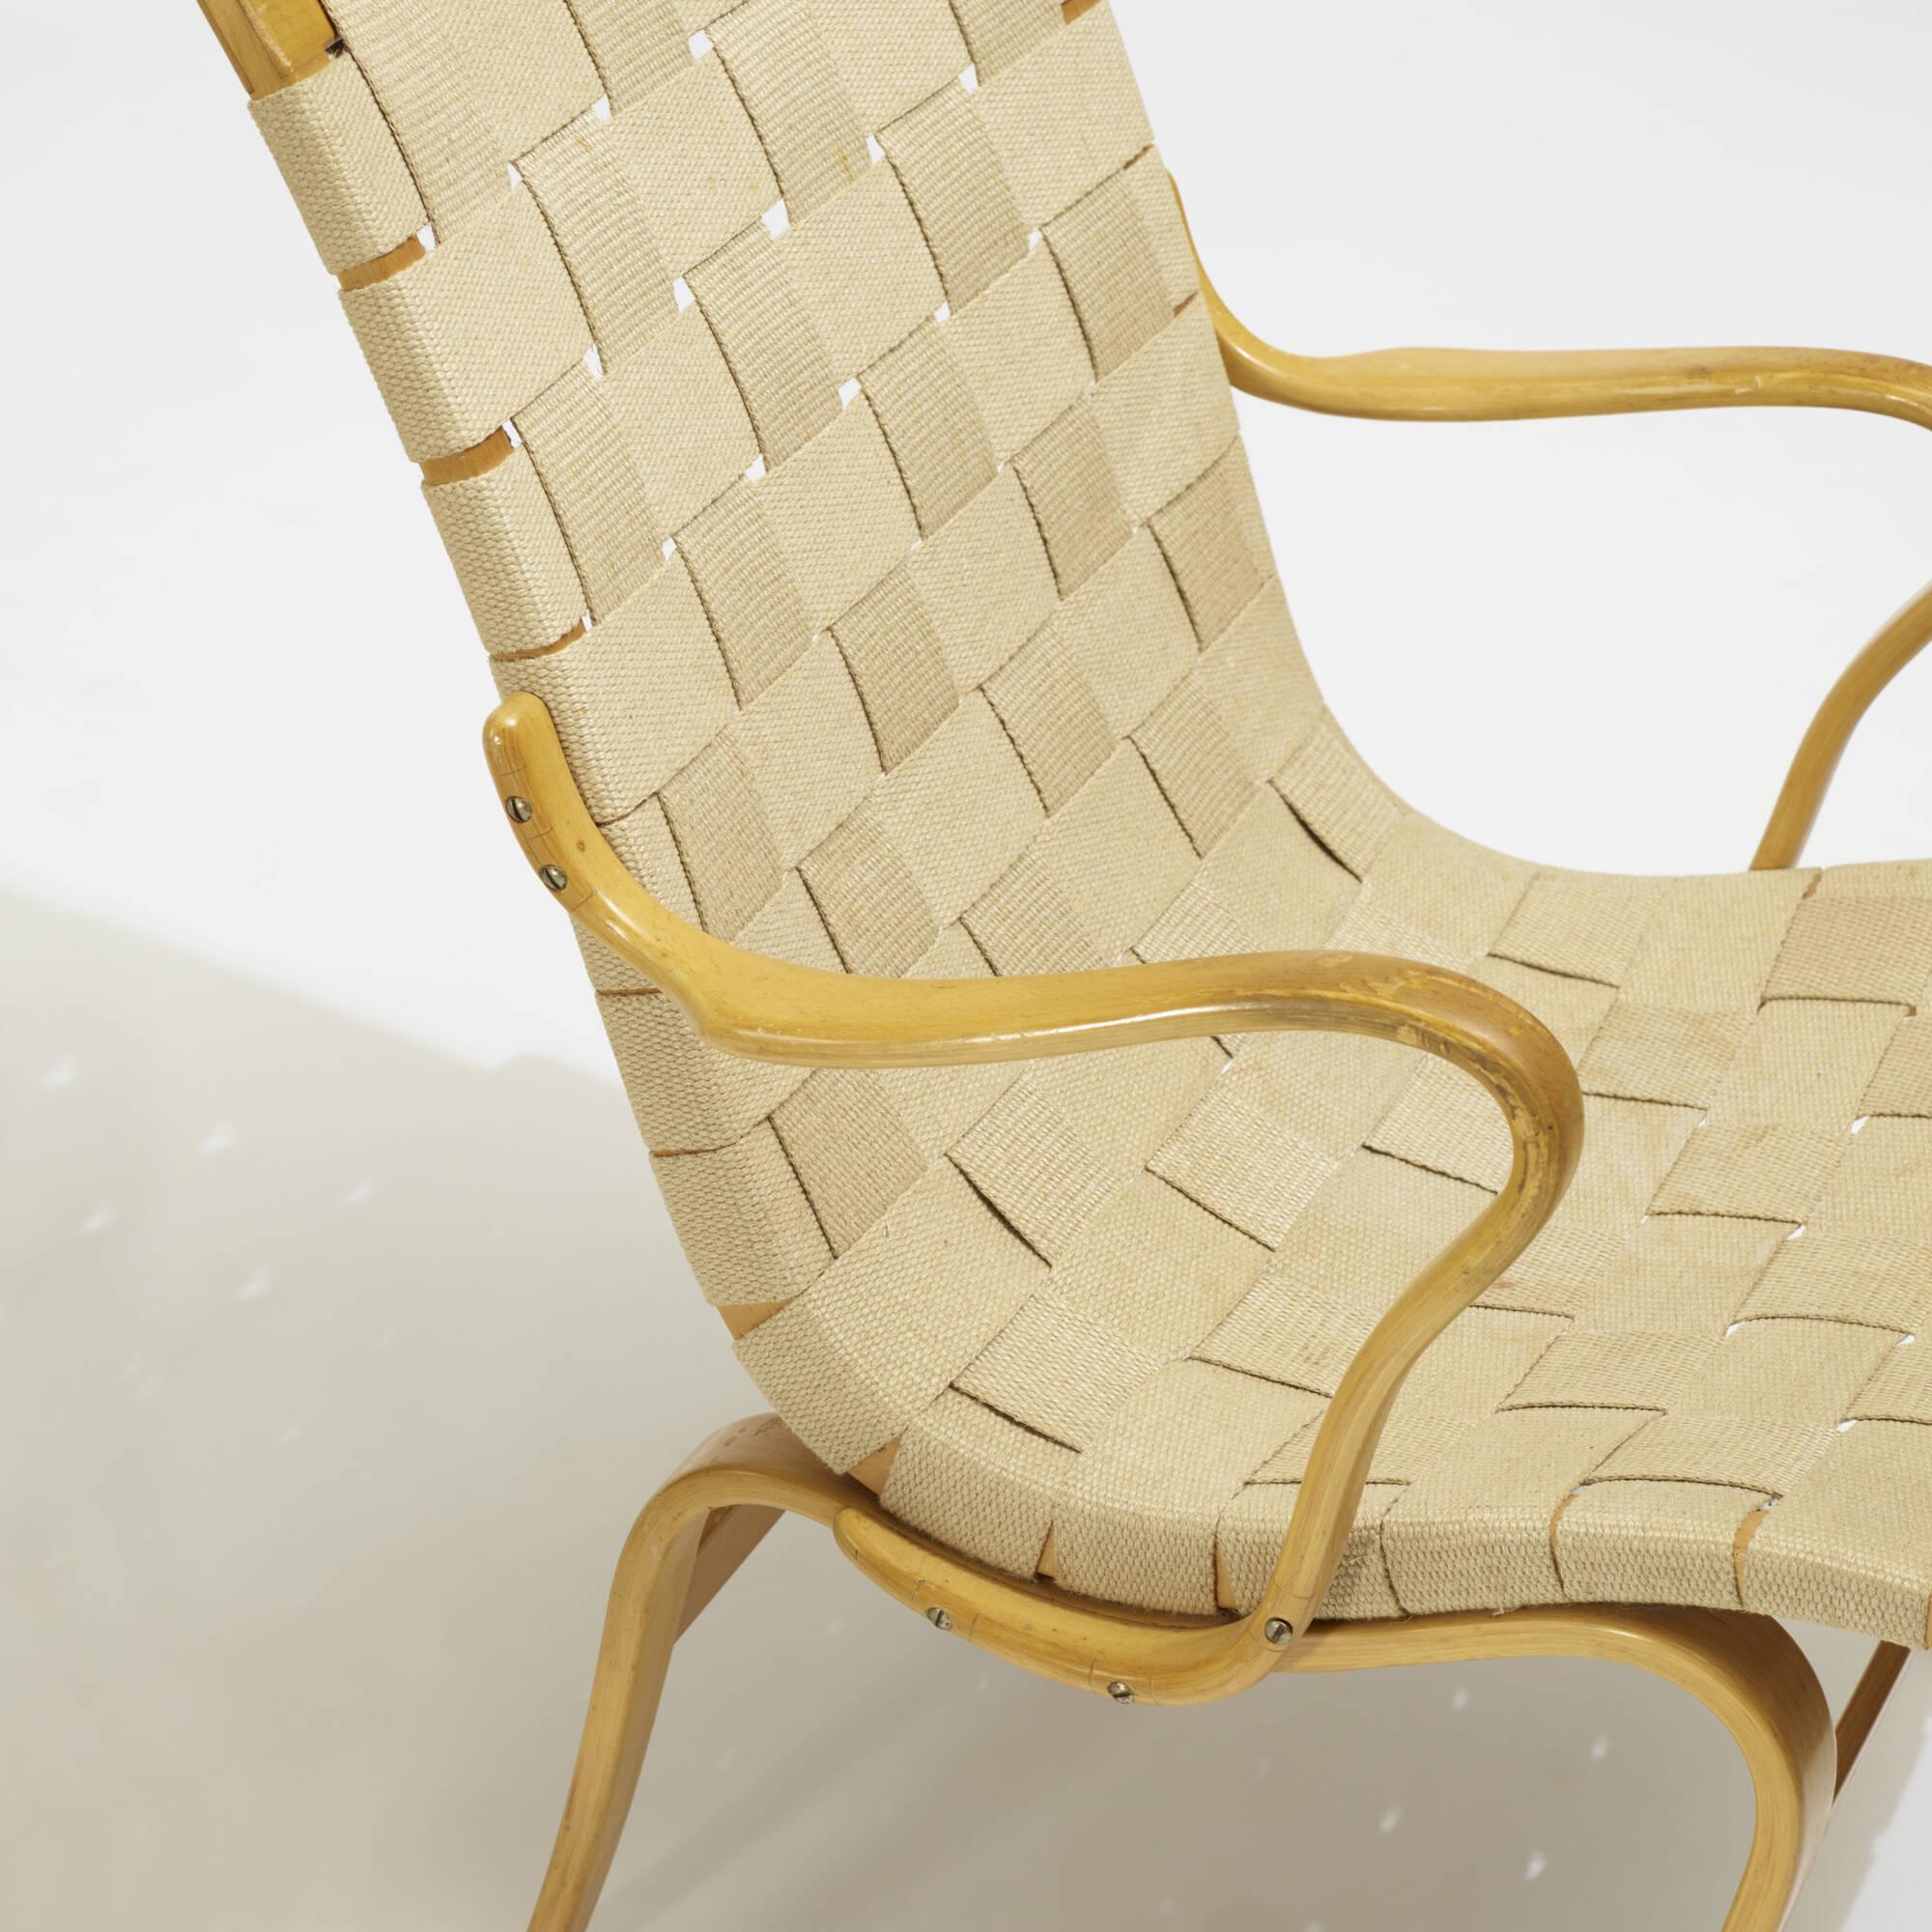 335: Bruno Mathsson / Eva chairs, pair (3 of 3)